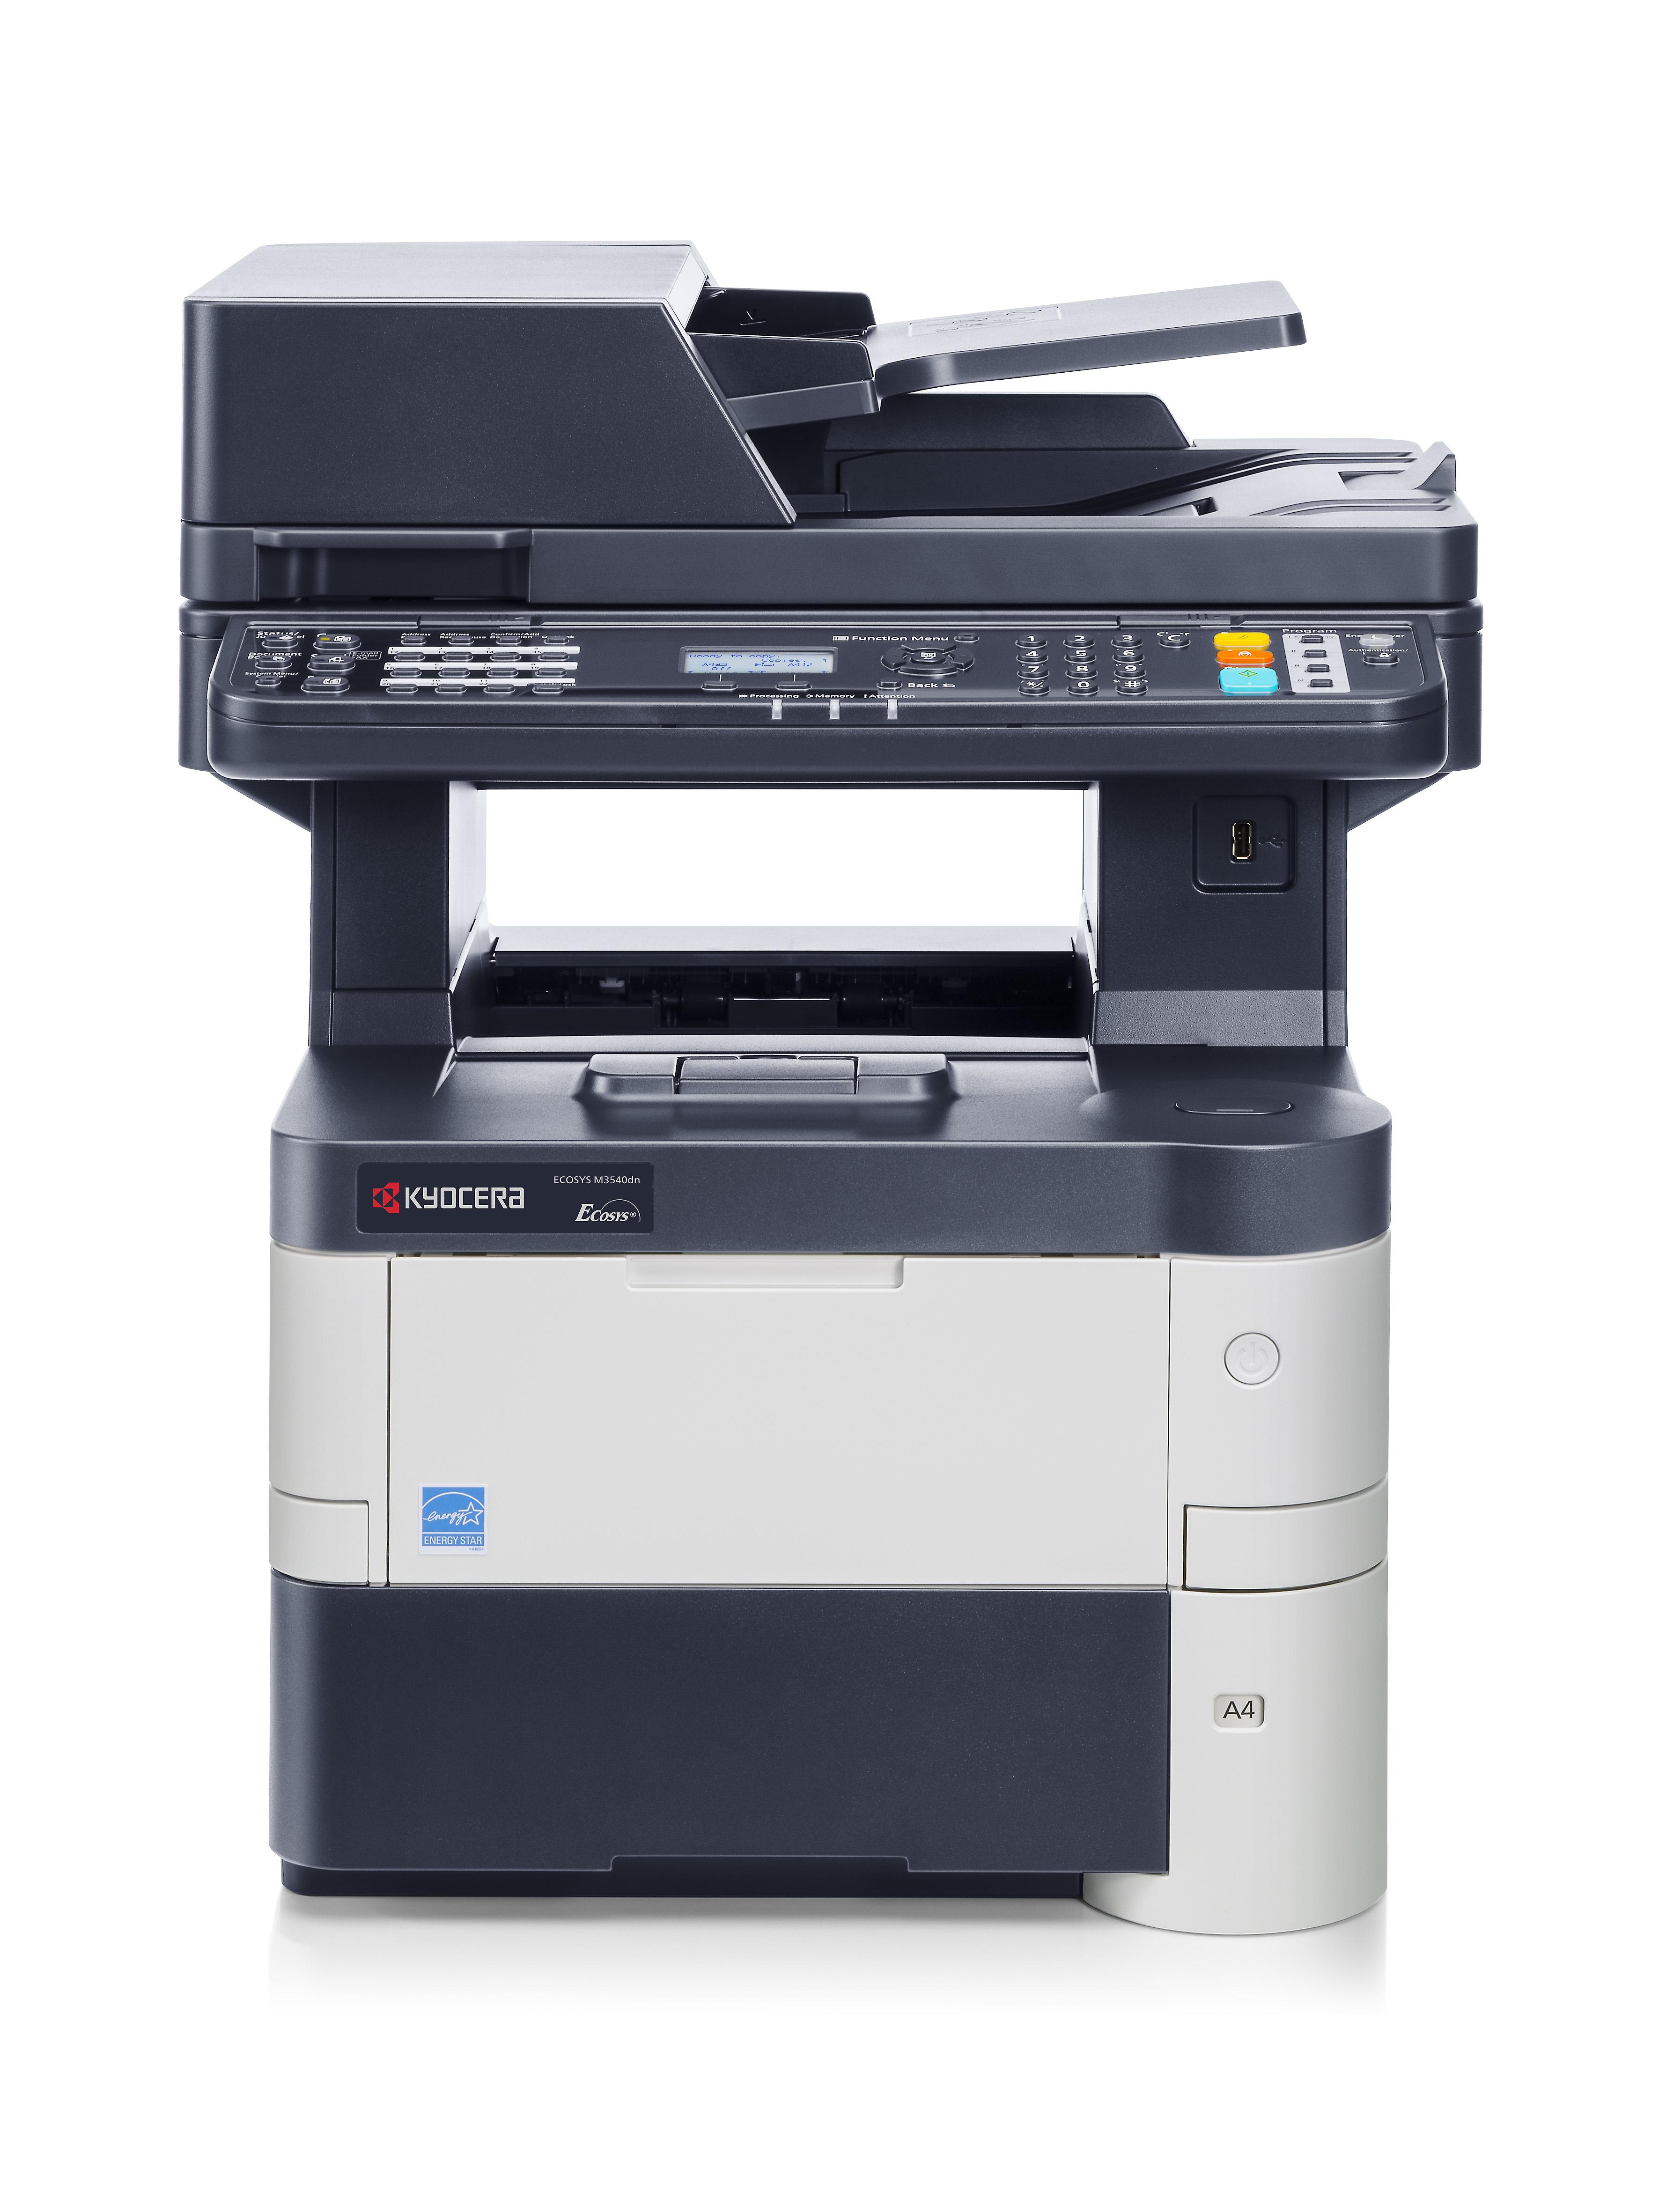 Kyocera ECOSYS M3540dn/KL3 - Multifunktionsdrucker - s/w